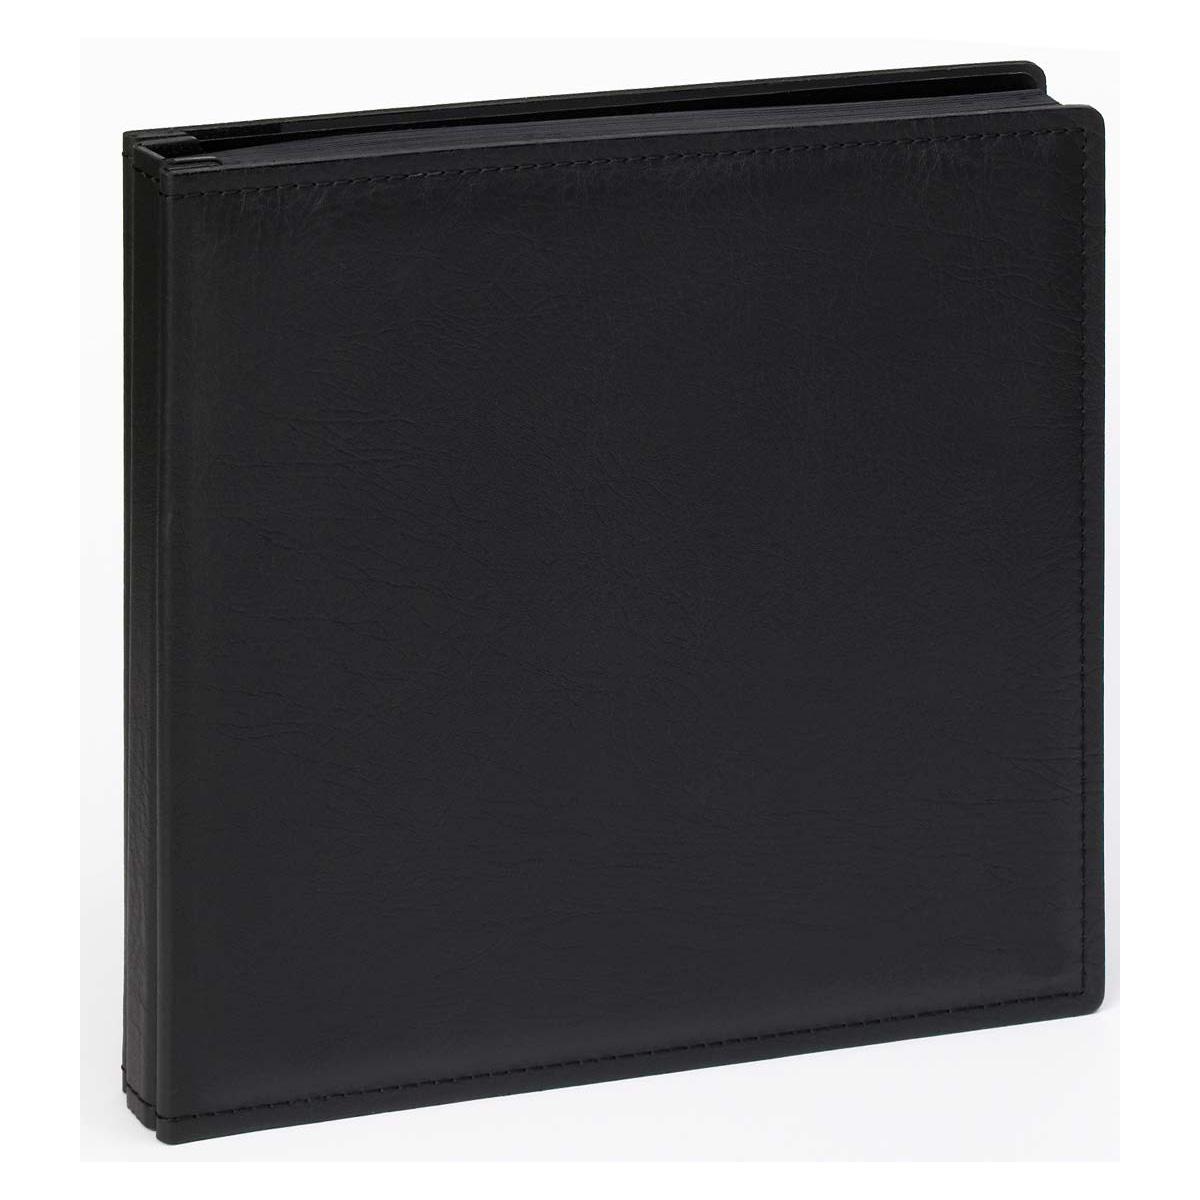 Buchschraubenalbum Premium, 80 schwarze Seiten